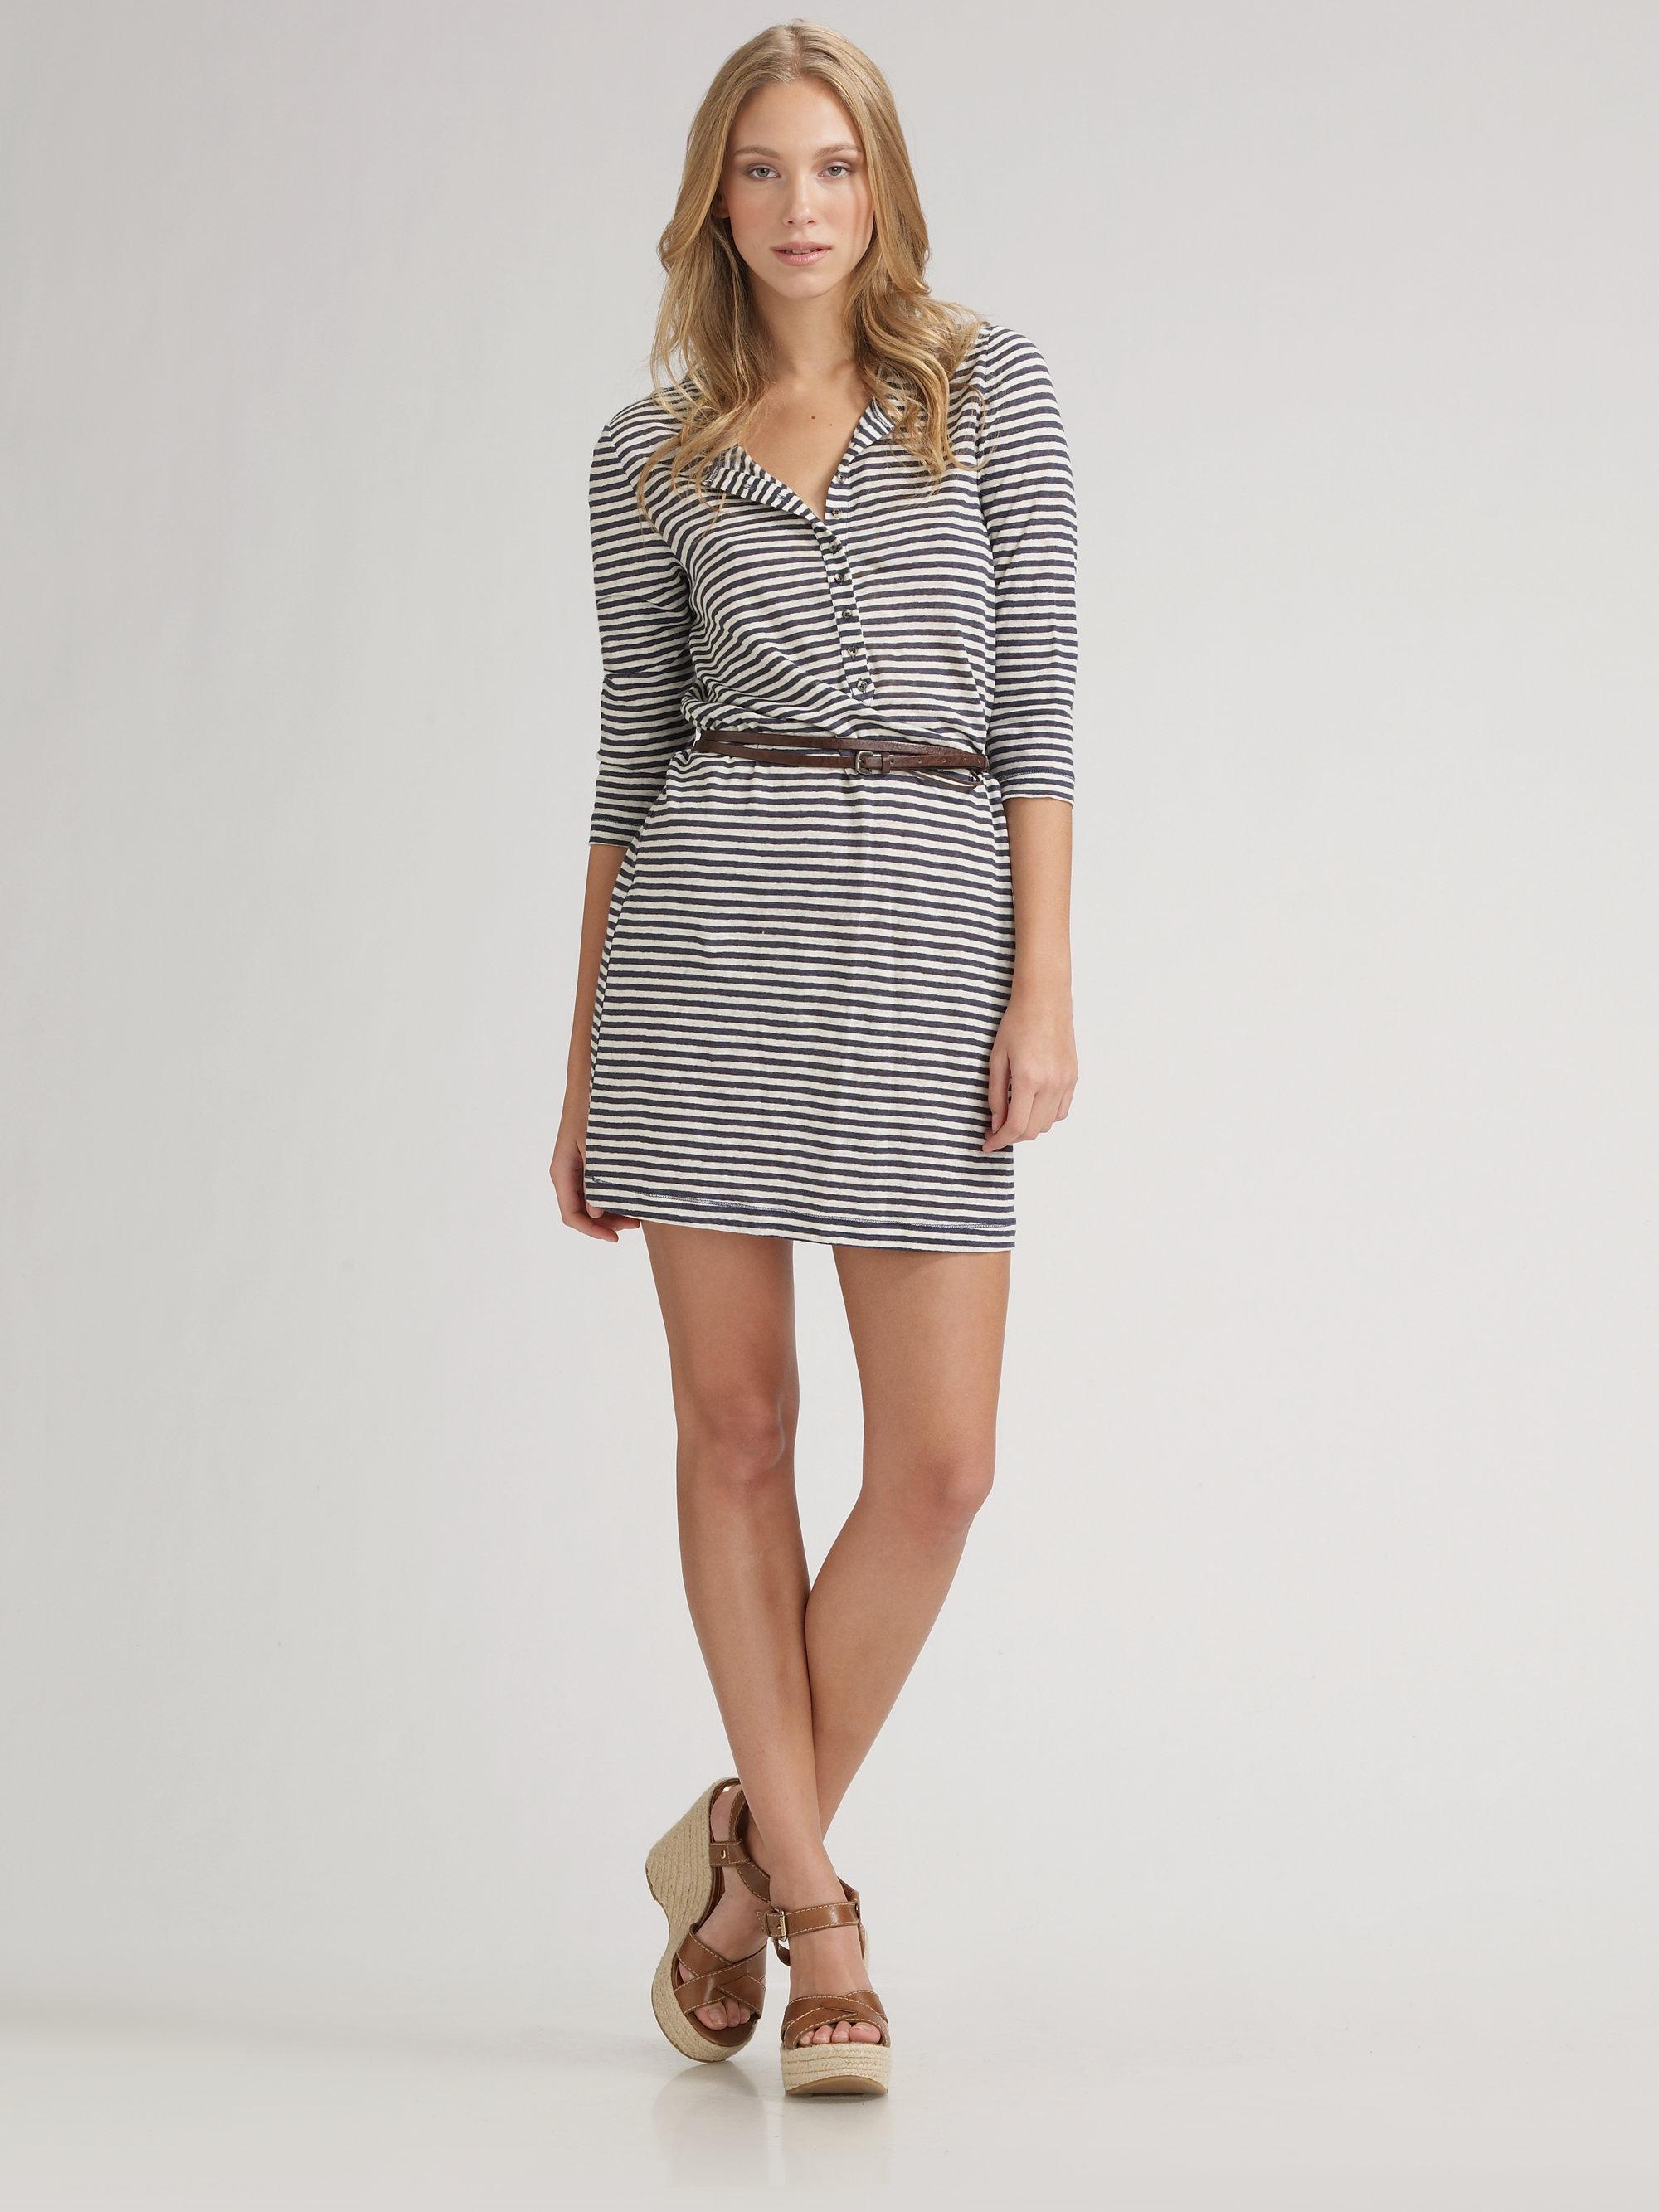 1d2a71a52e Lyst - Joie Striped Linen Dress Belt in Gray